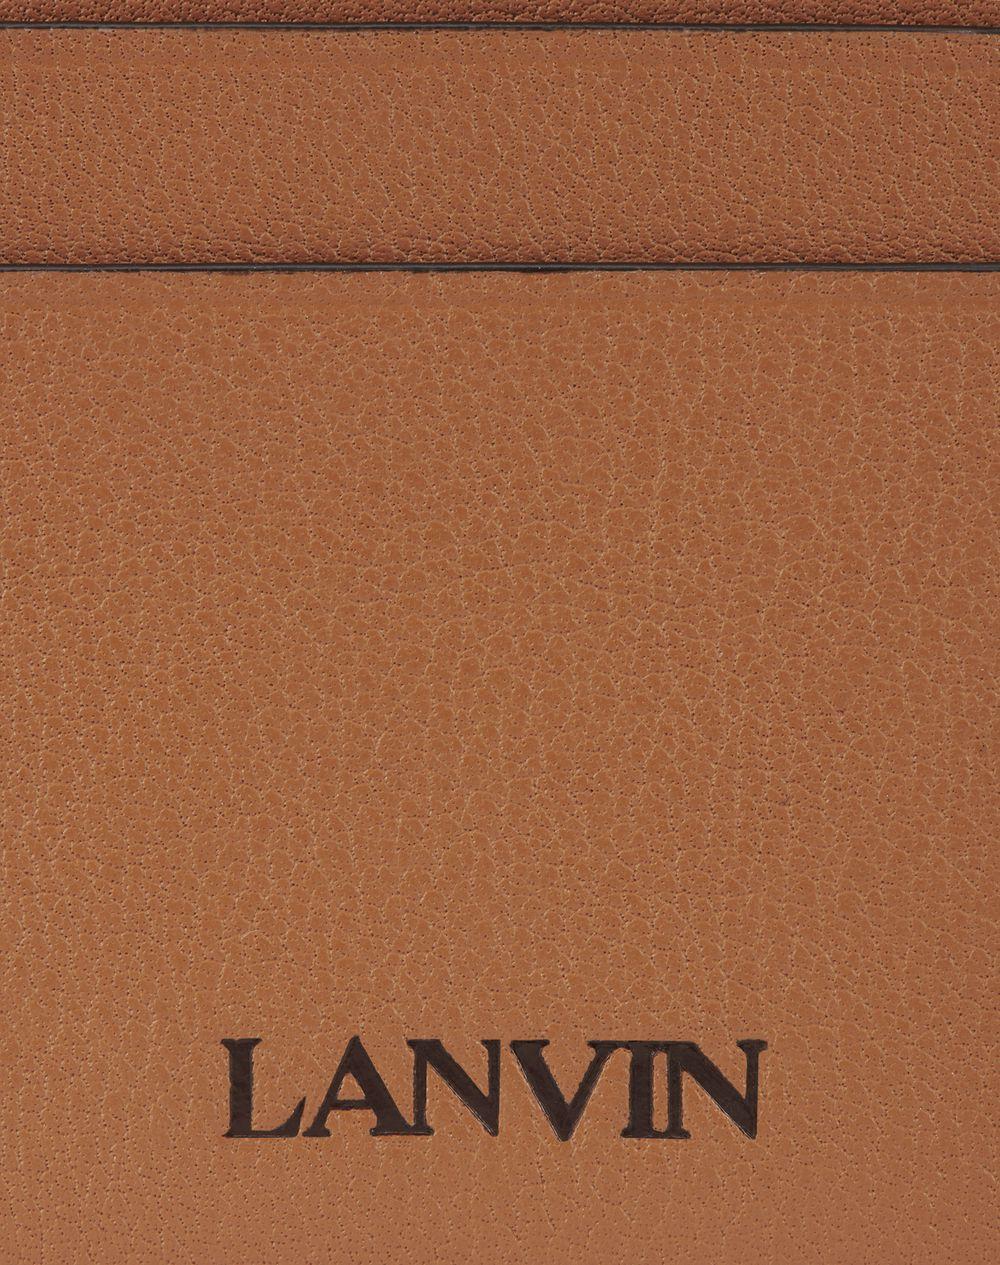 CARD HOLDER IN CALFSKIN LEATHER - Lanvin